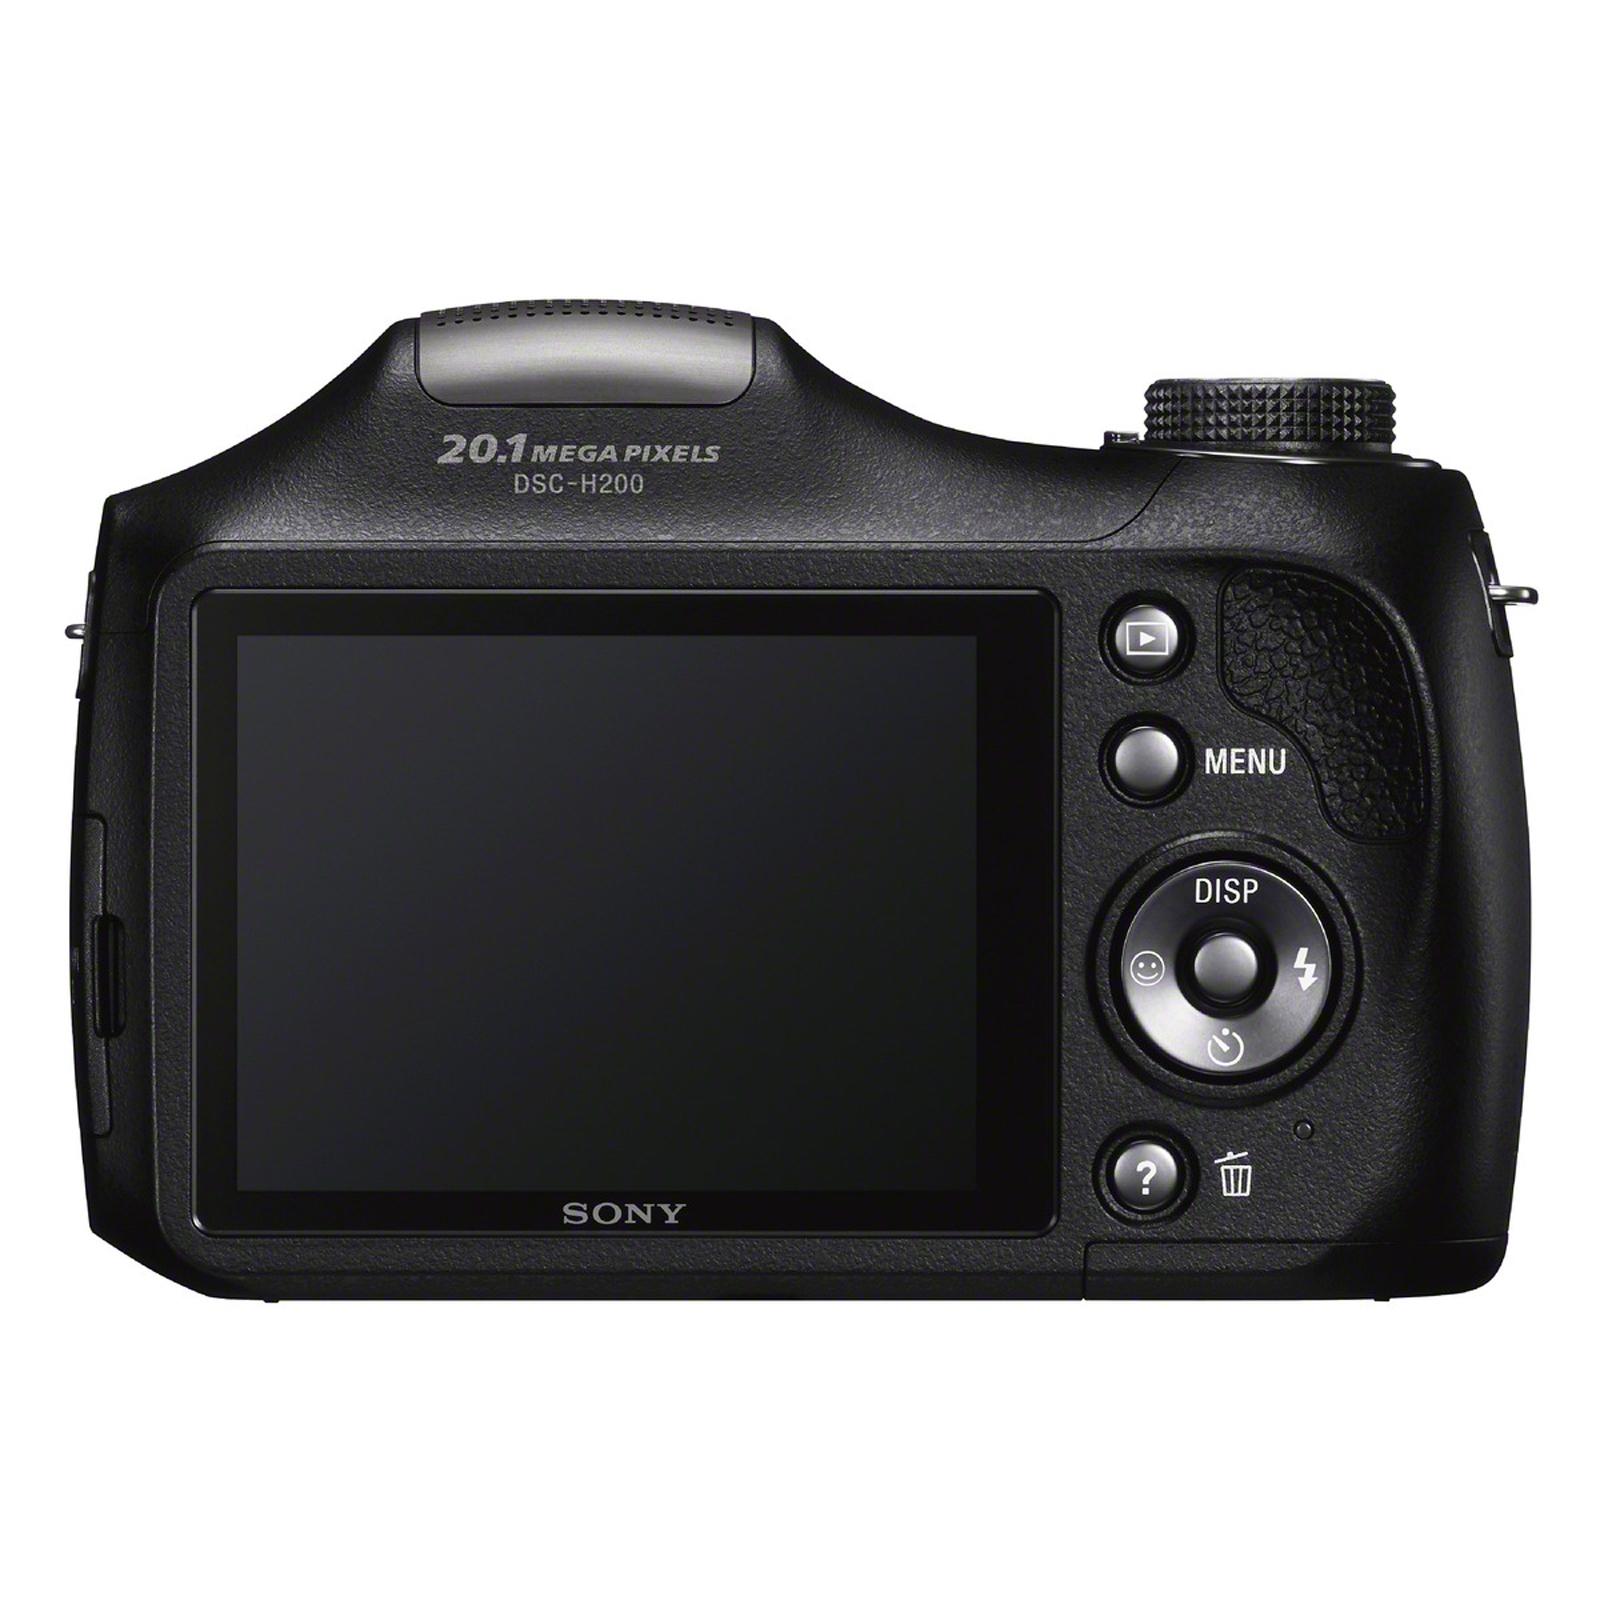 Sony High Zoom Digital Camera 20.1-Megapixel DSC-H200/B Black